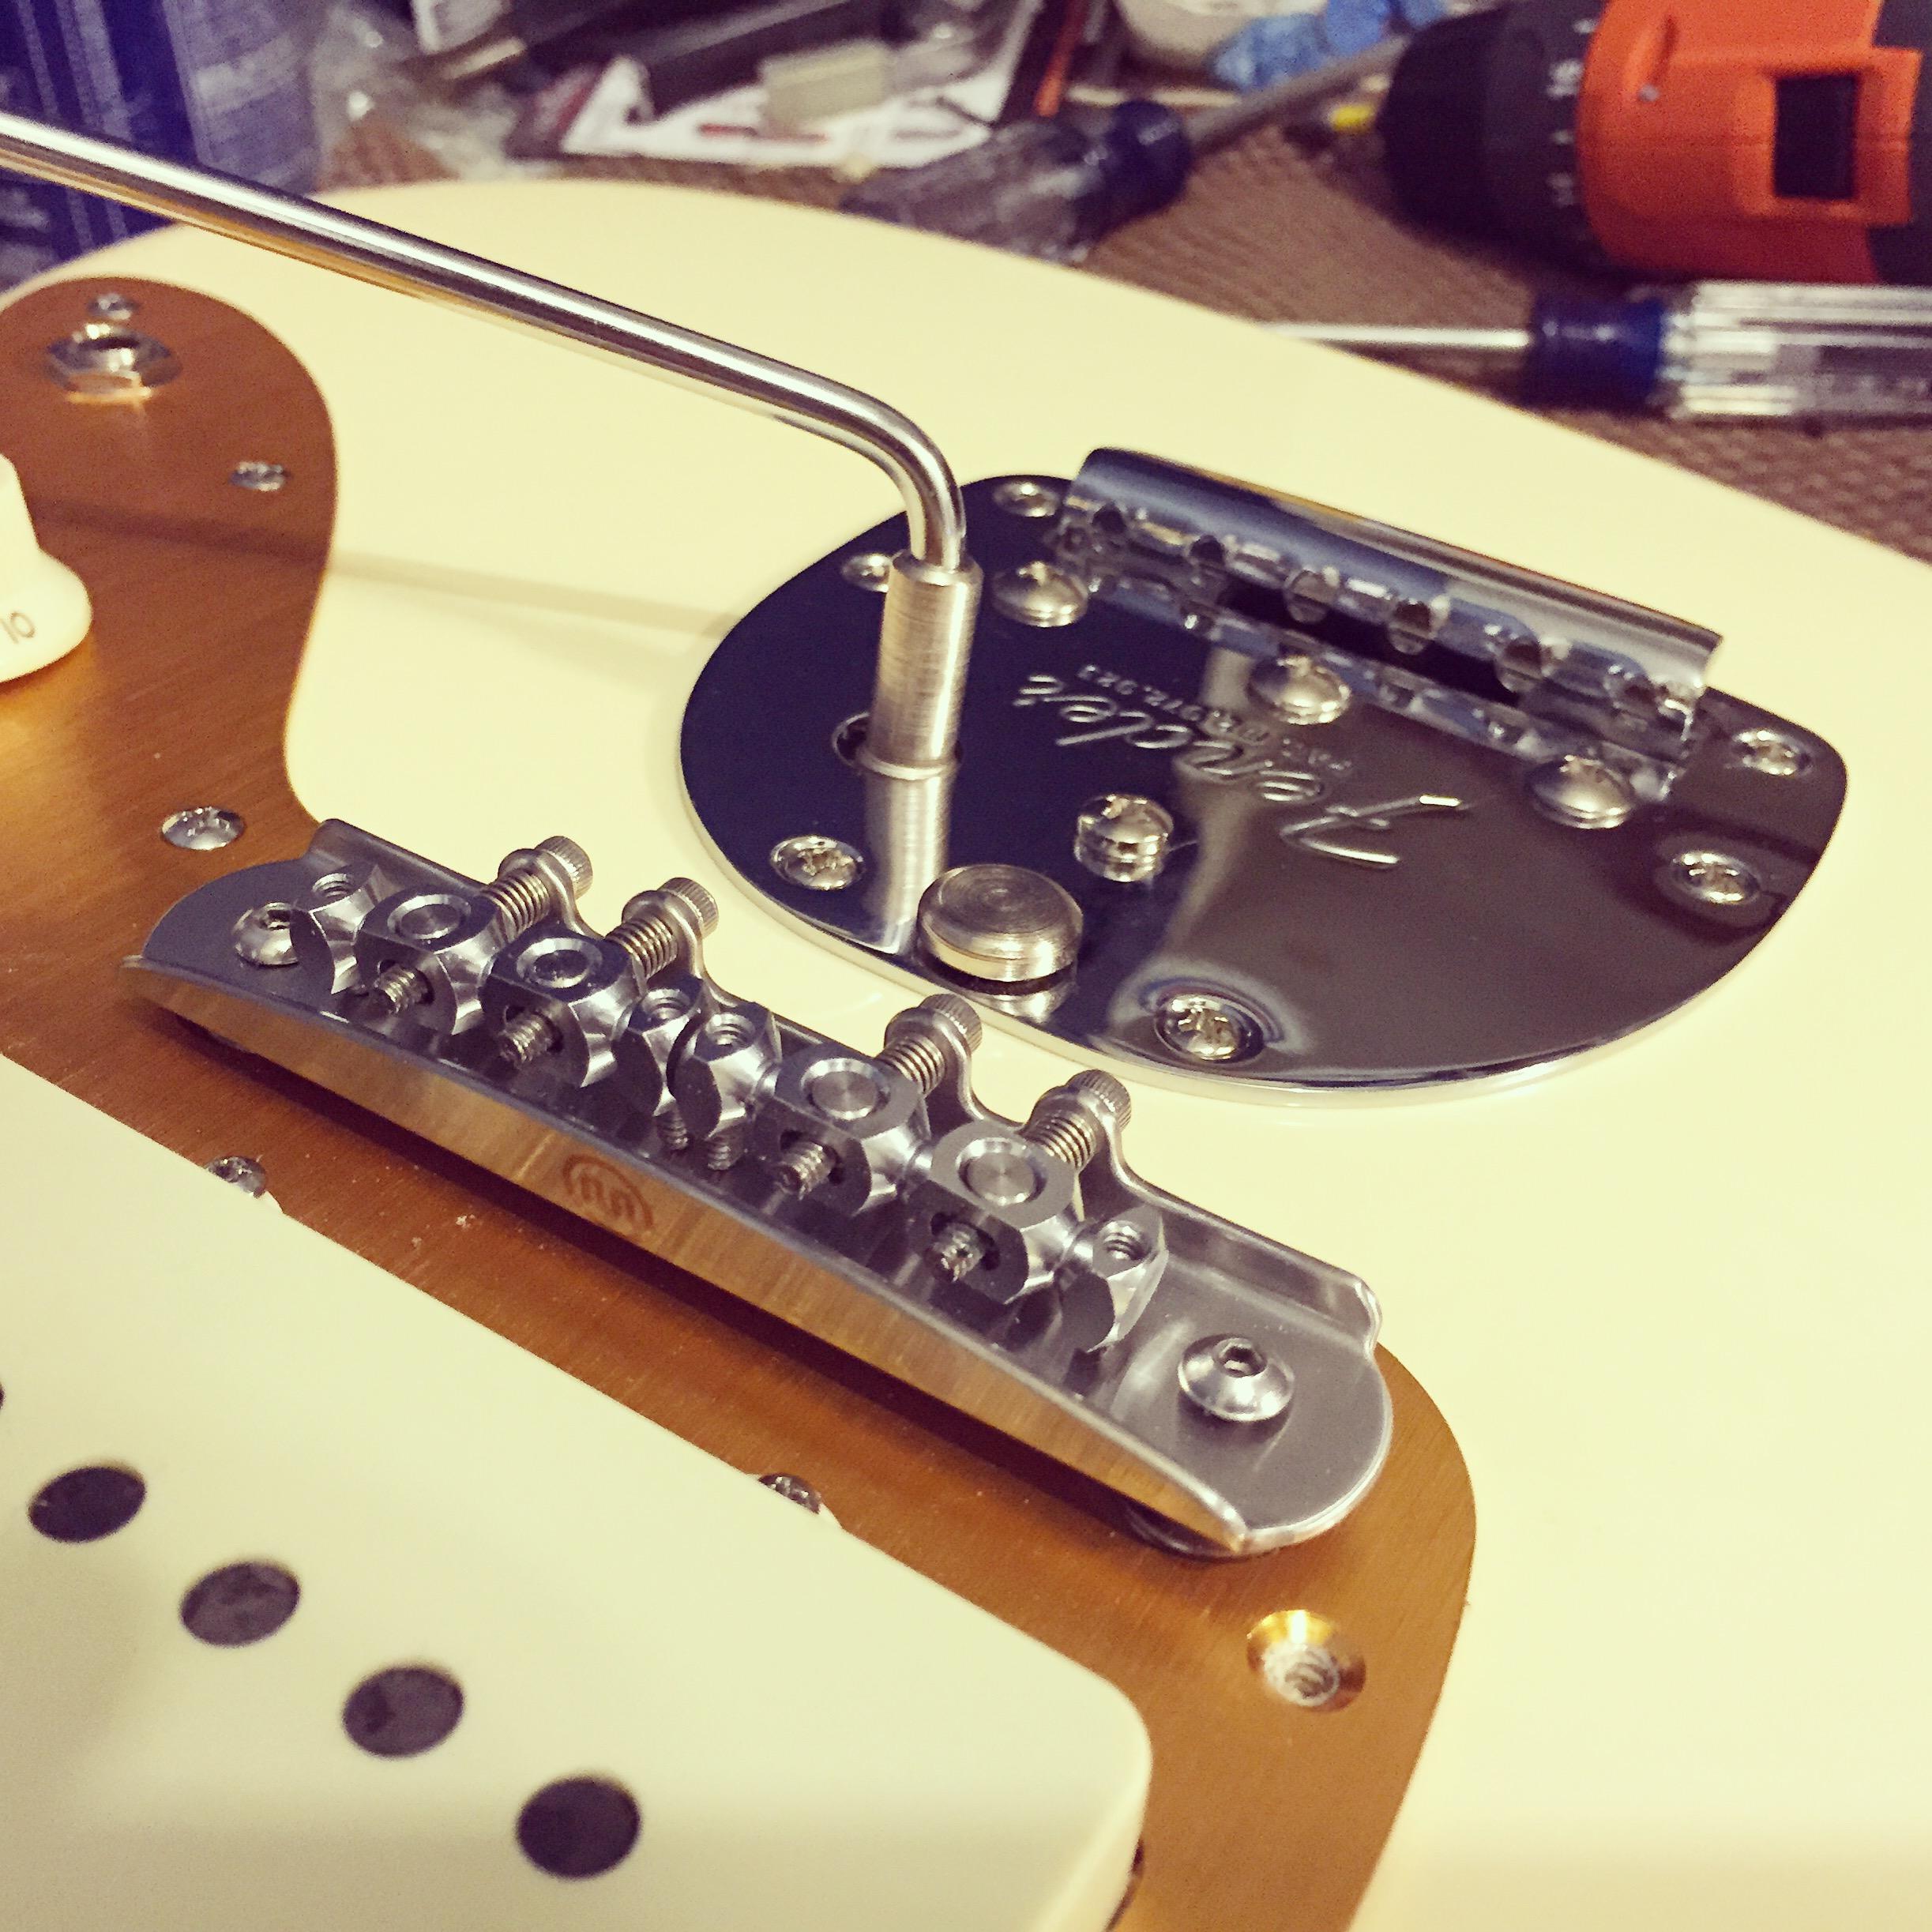 Fender Affinity Jazzmaster Wiring Diagram on